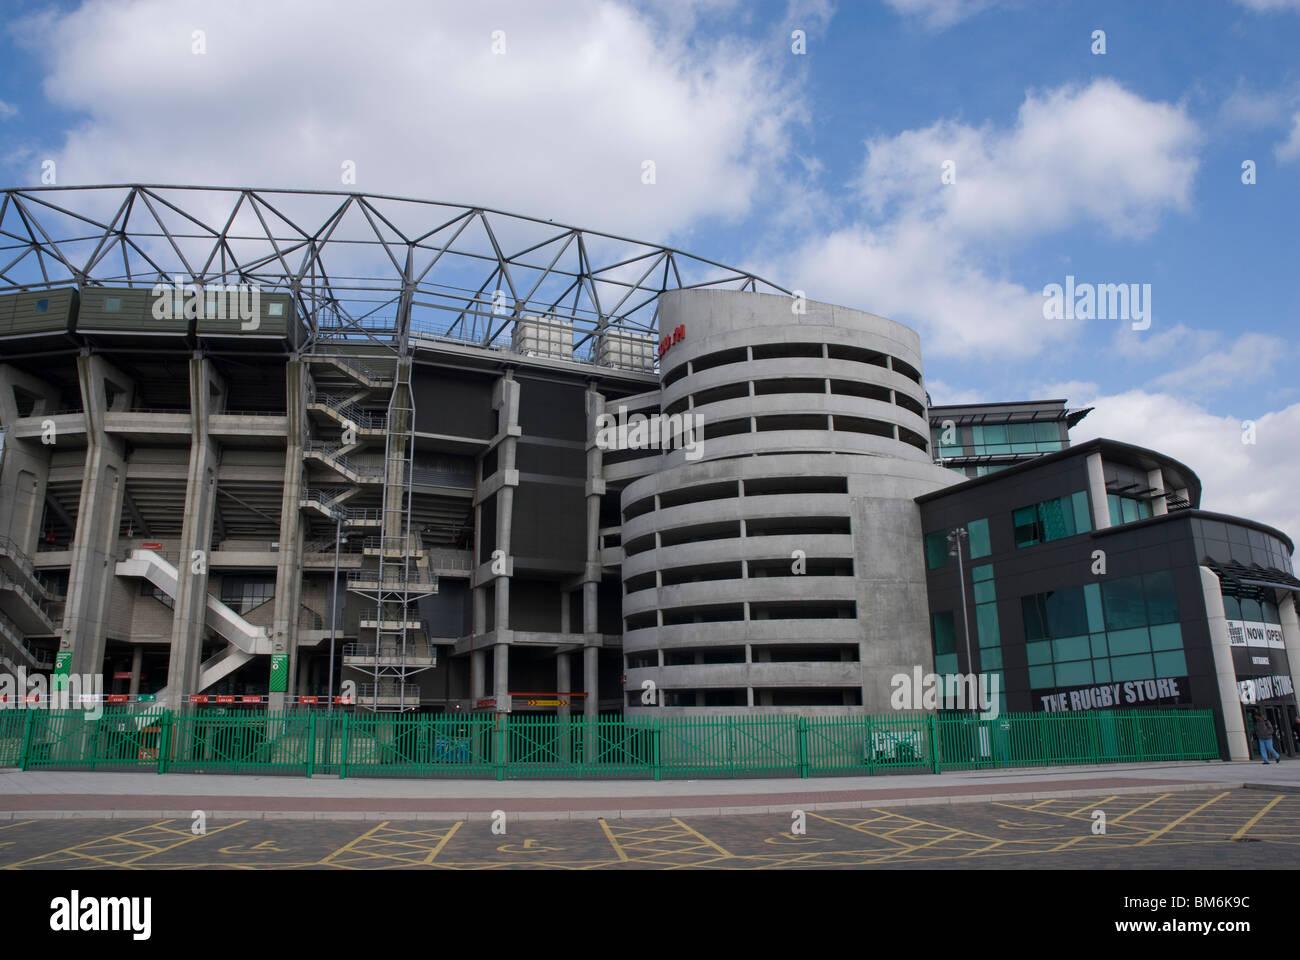 Twickenham Rugby Grounds Twickenham London - Stock Image